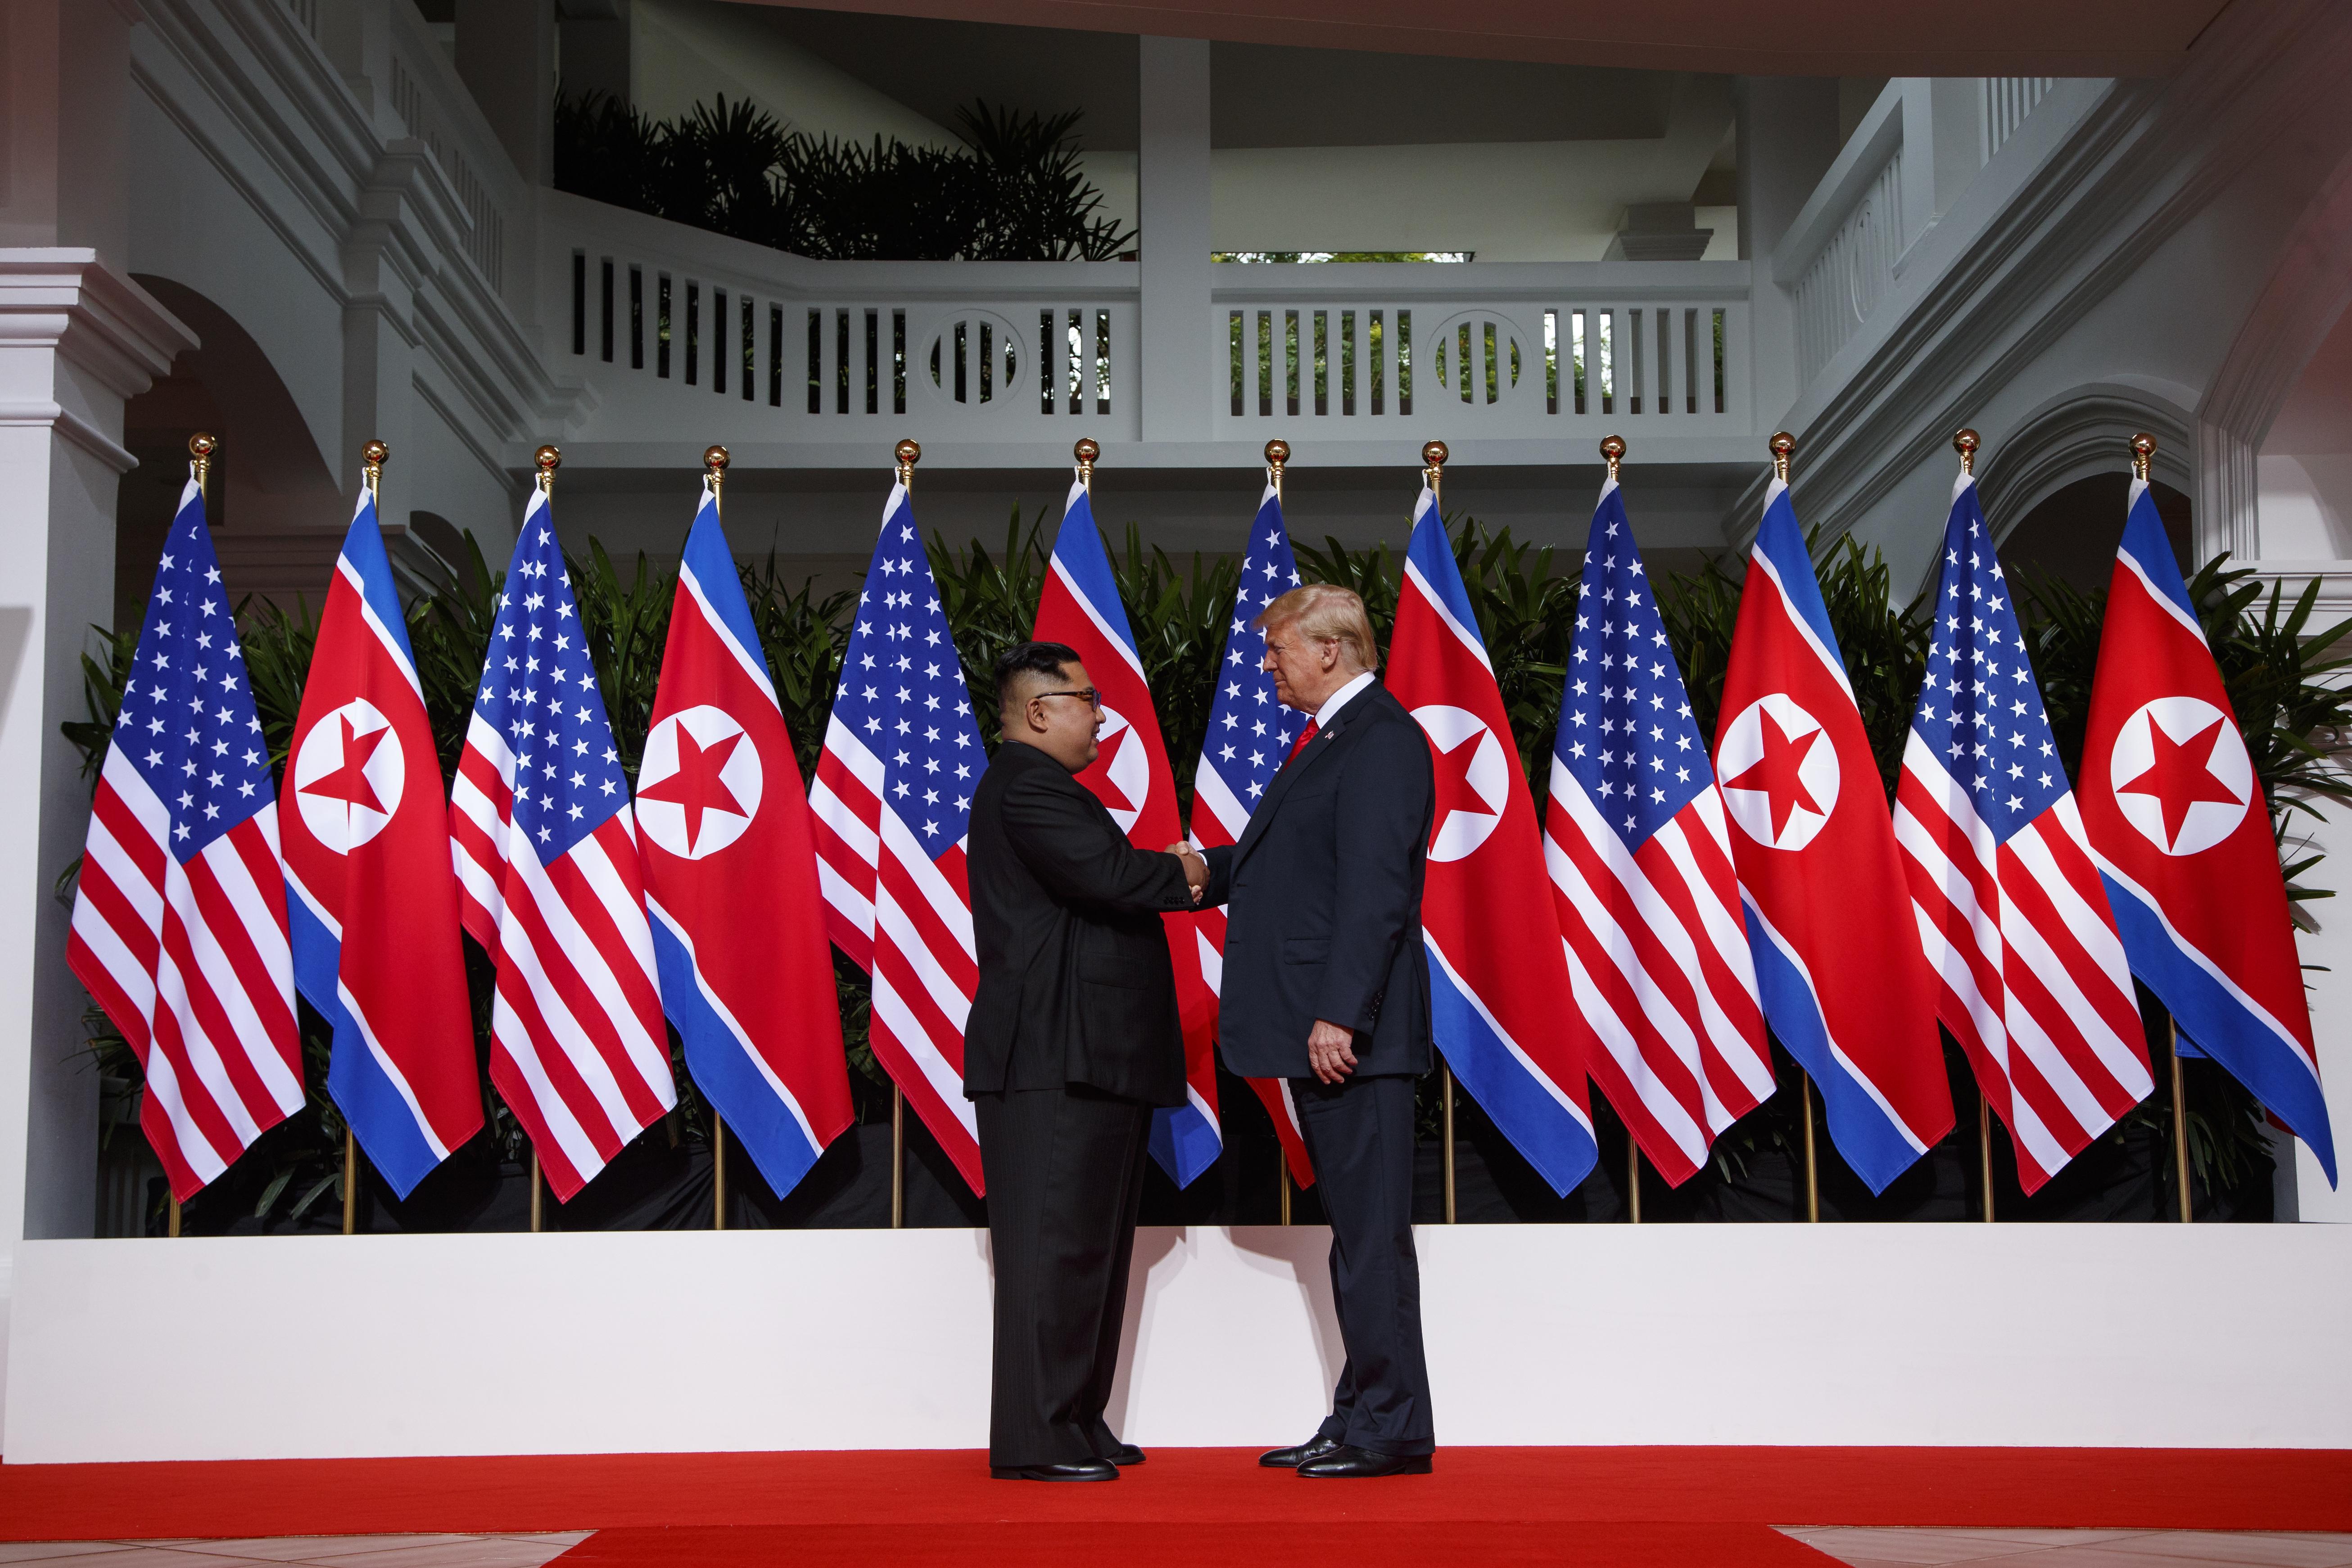 Kim Jong Un y Donald Trump se dan la mano frente a una fila de banderas (© Evan Vucci/AP Images)